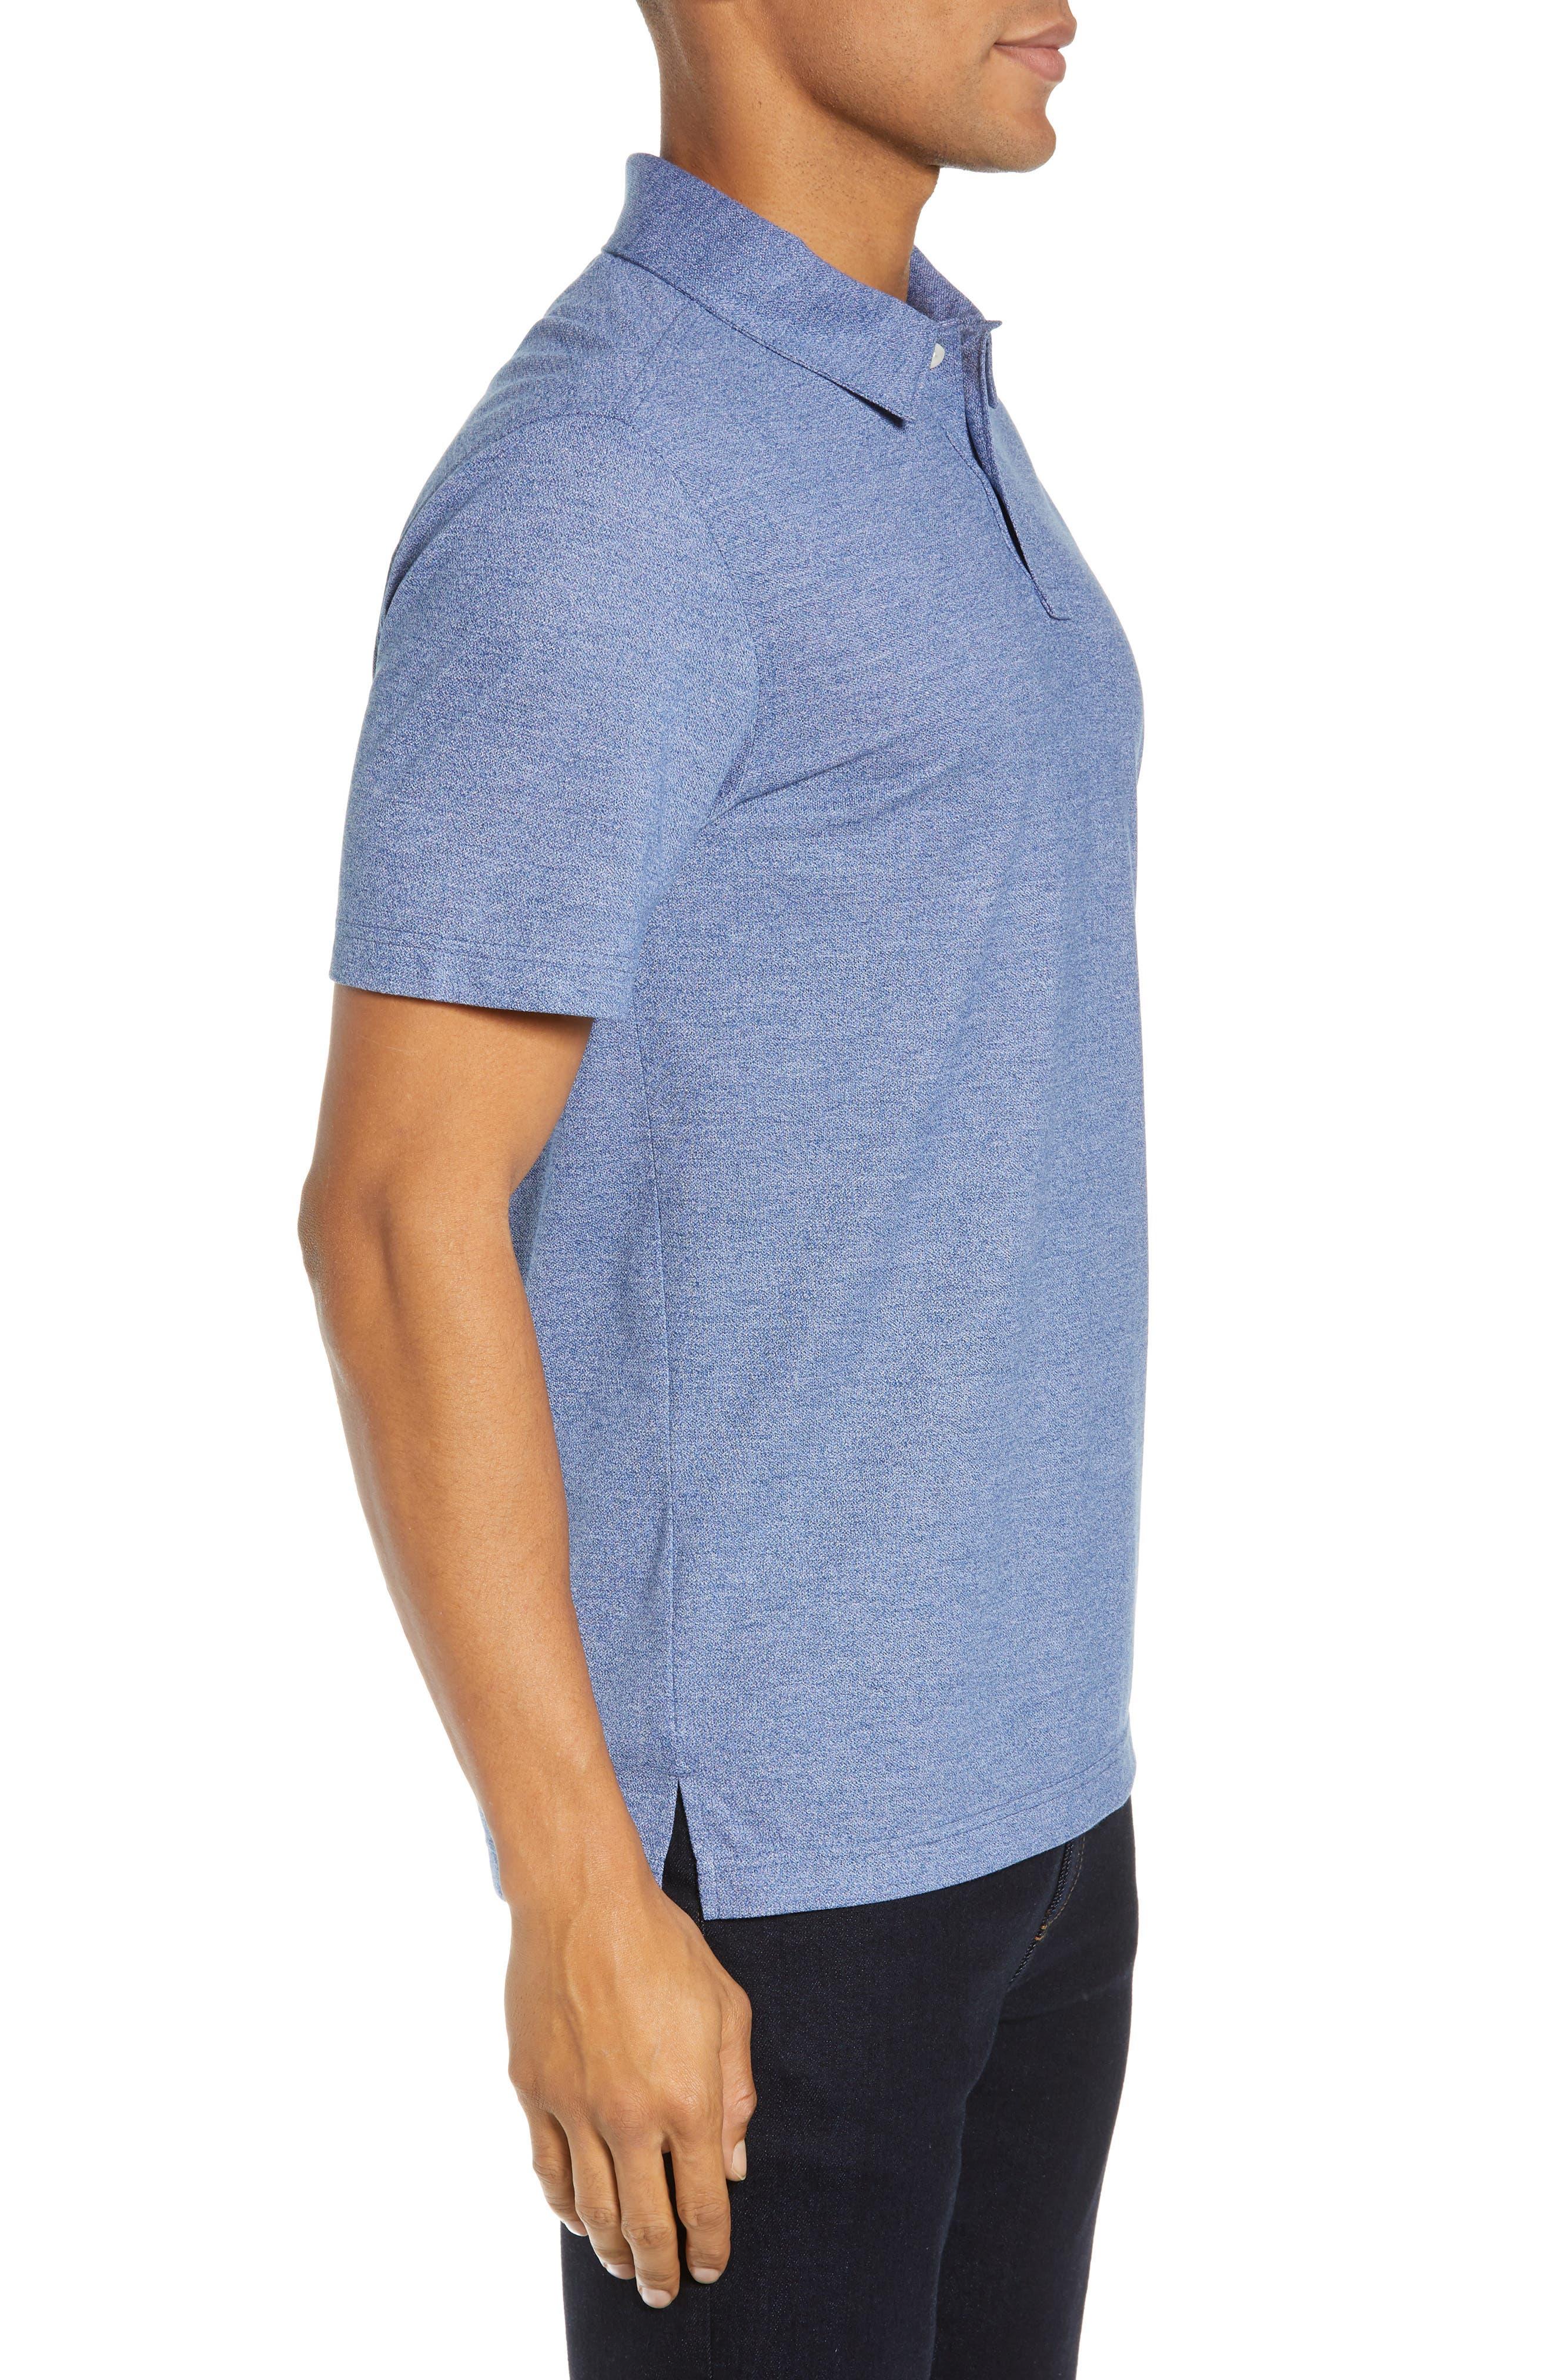 NORDSTROM MEN'S SHOP,                             Regular Fit Polo,                             Alternate thumbnail 3, color,                             BLUE CASPIA MELANGE